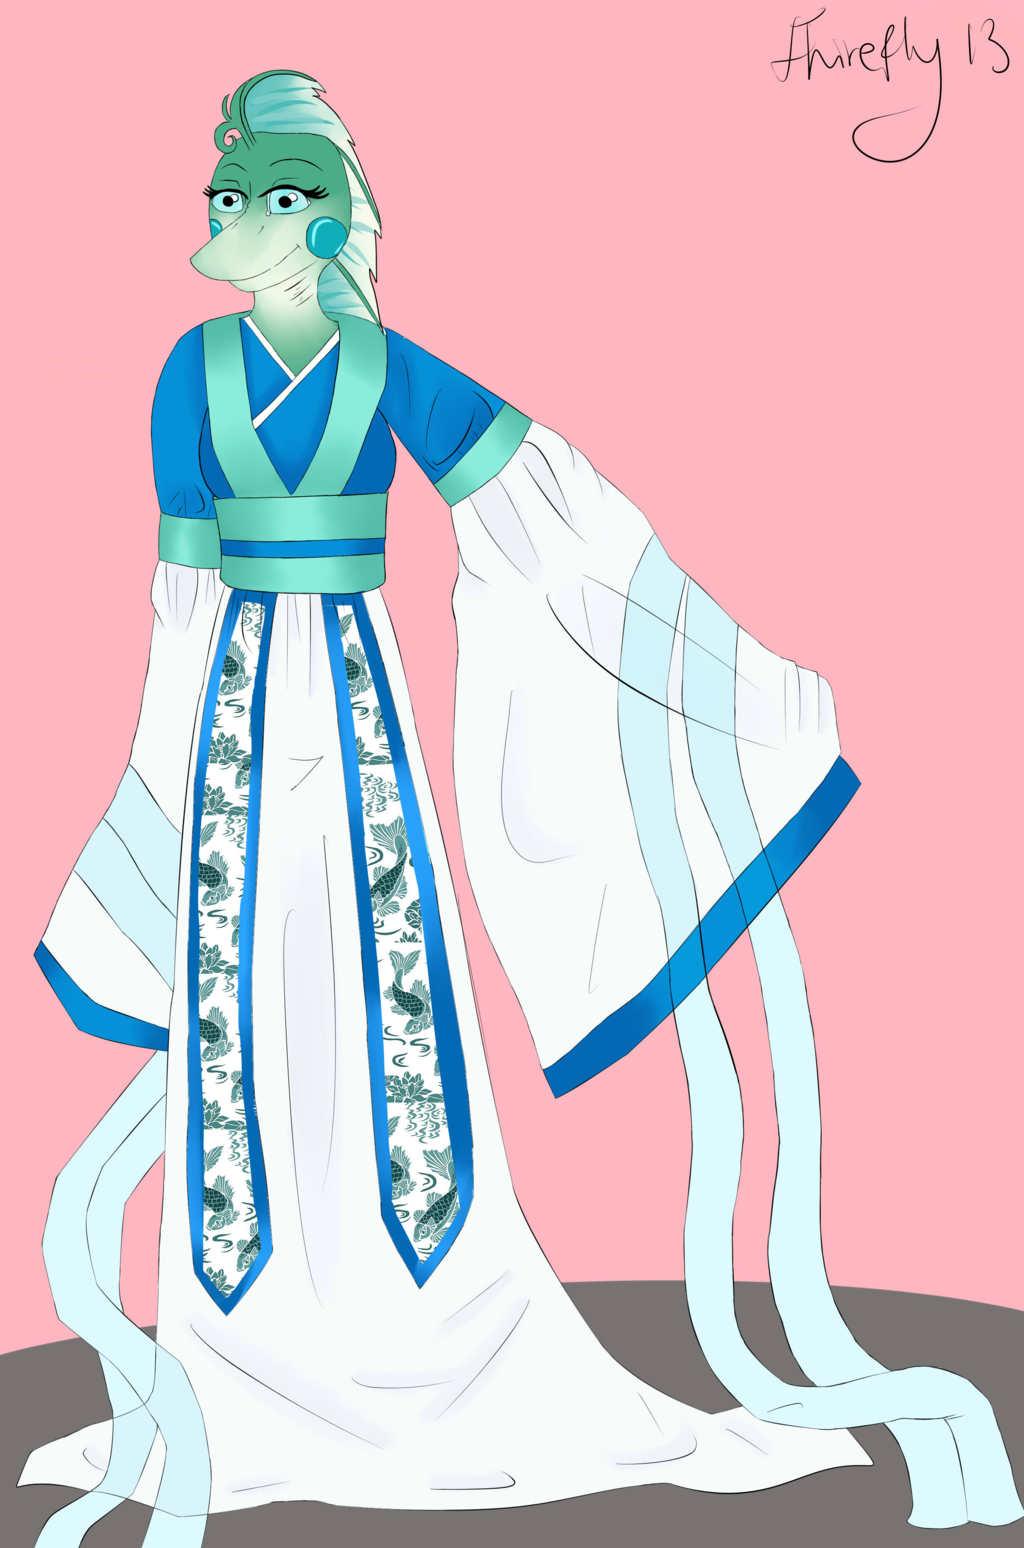 Persephone Hanfu Commission